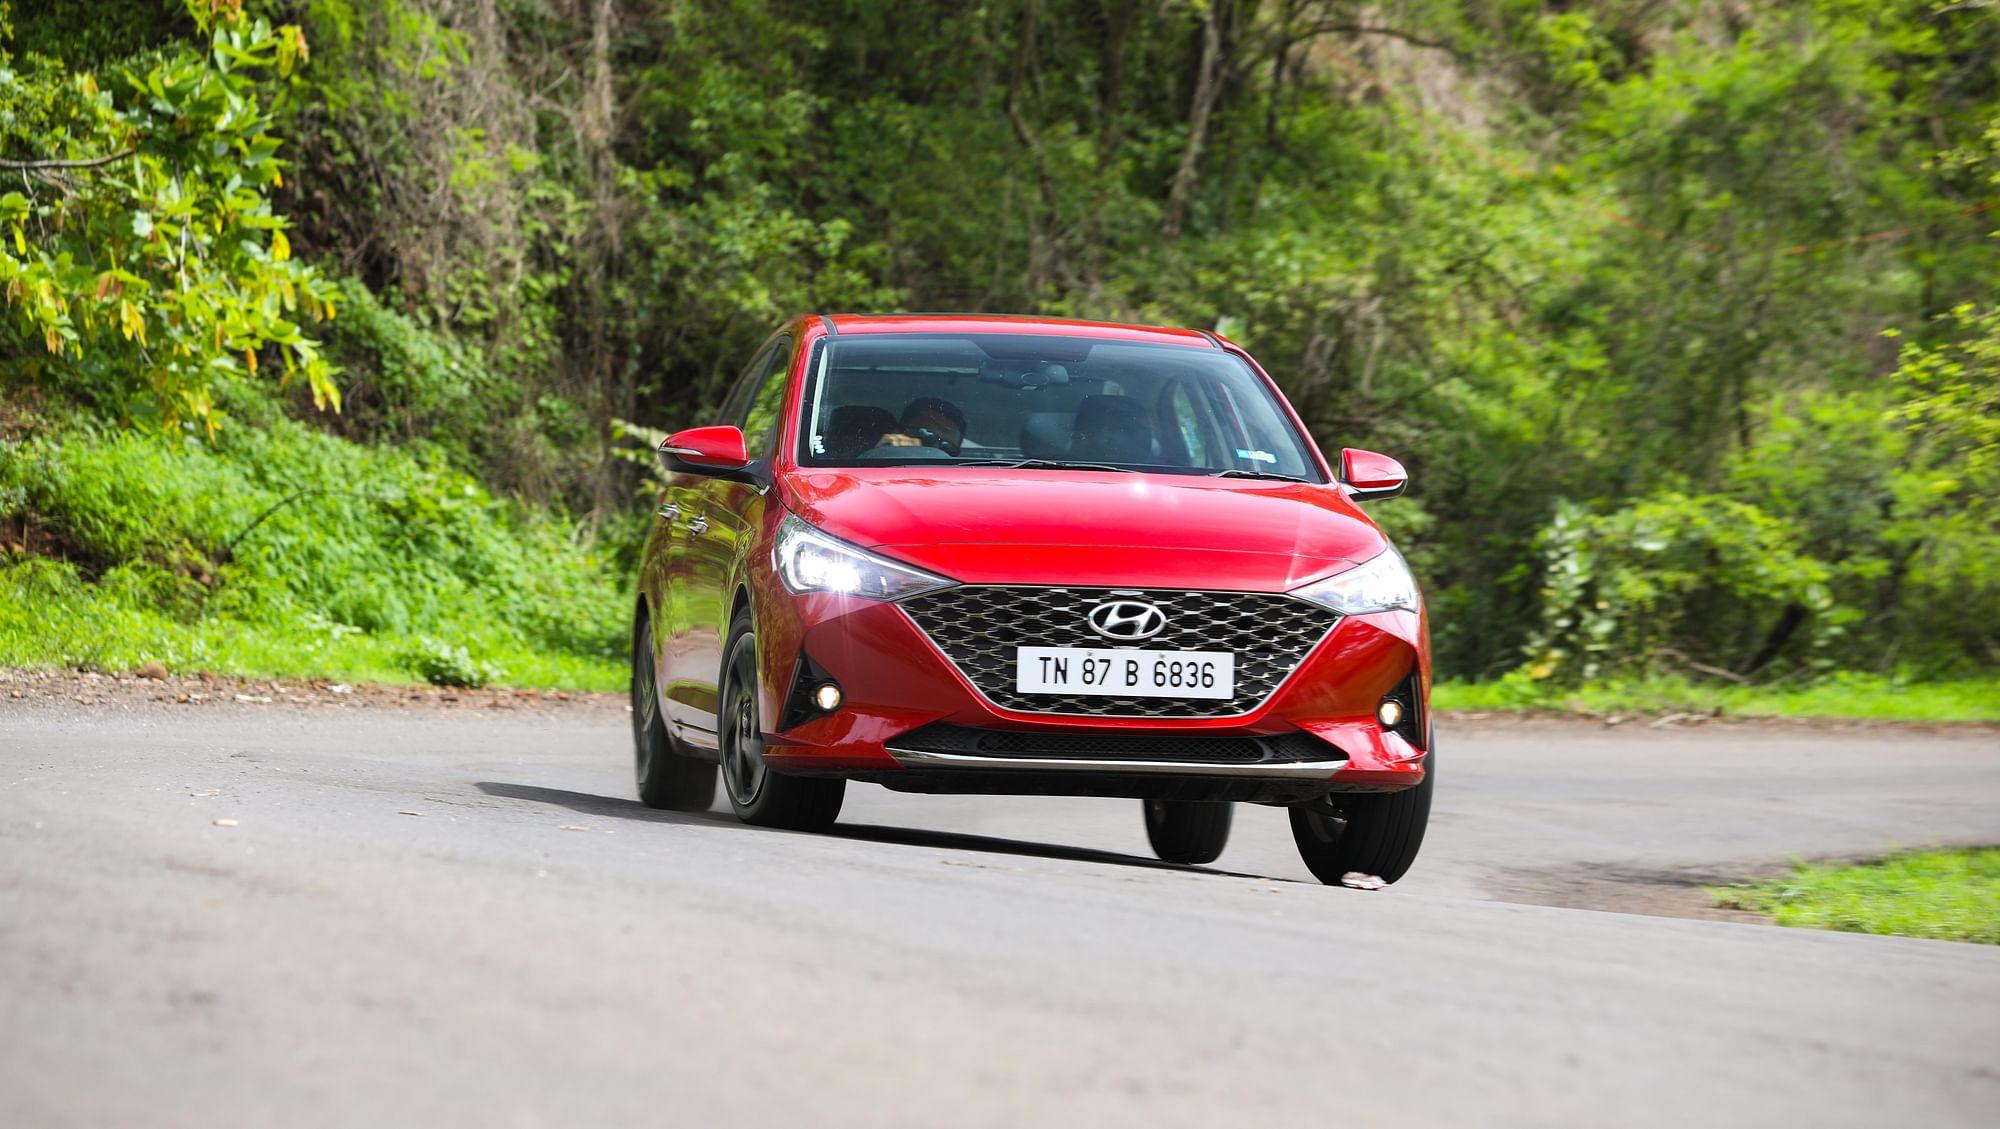 2020 Hyundai Verna First Drive Review